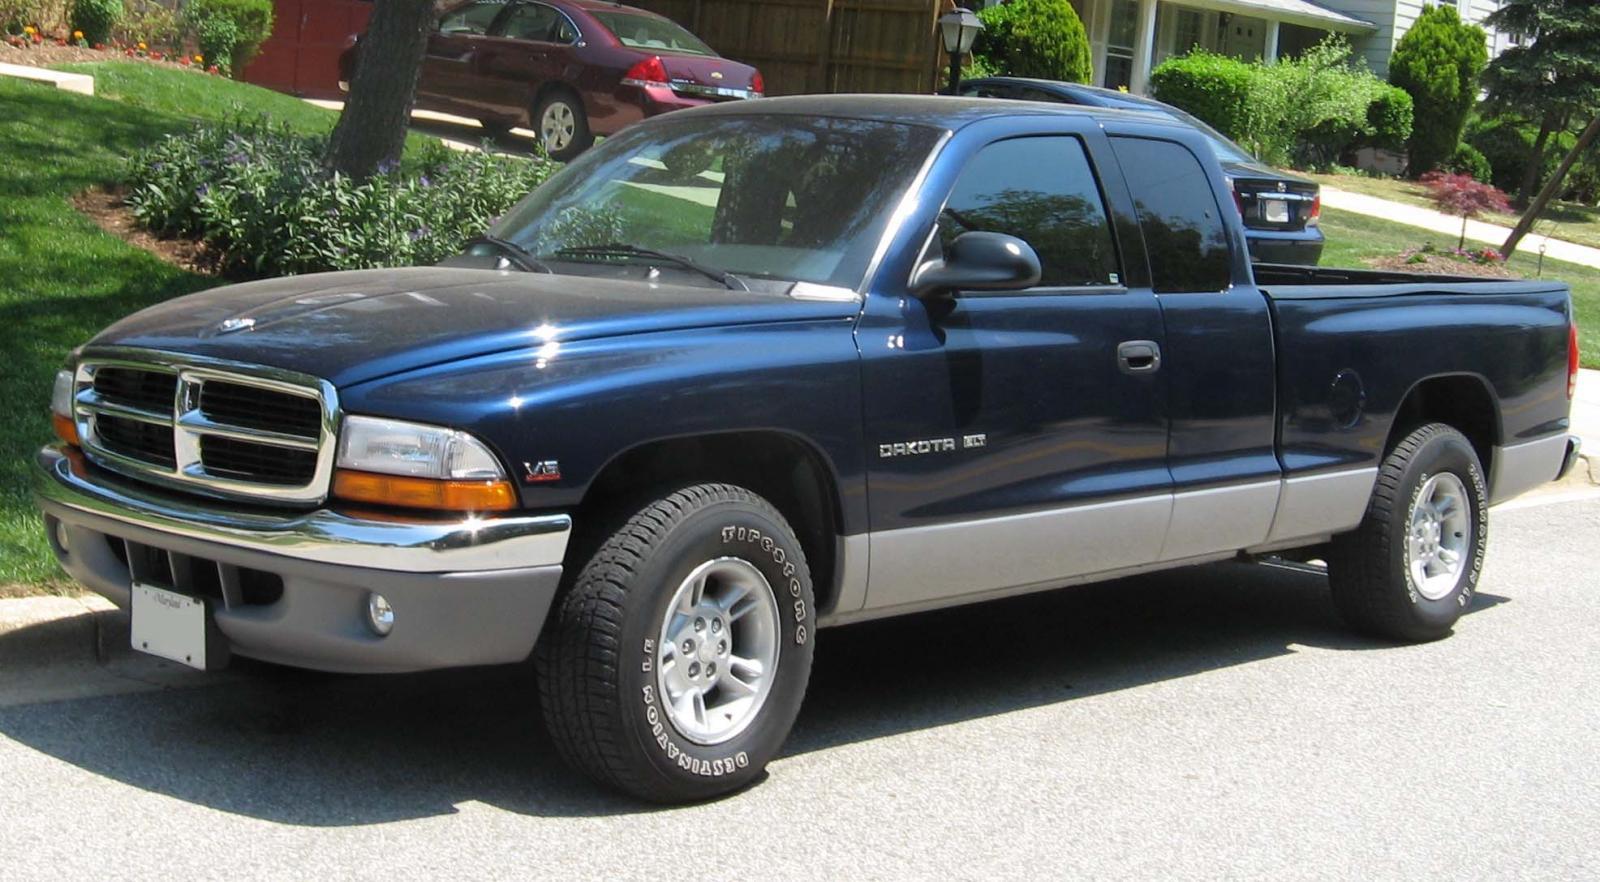 2002 Dodge Dakota 1600px 3. 2002 Dodge Dakota 3. Dodge. 2003 Dodge Dakota 3 9l Engine Diagram At Scoala.co